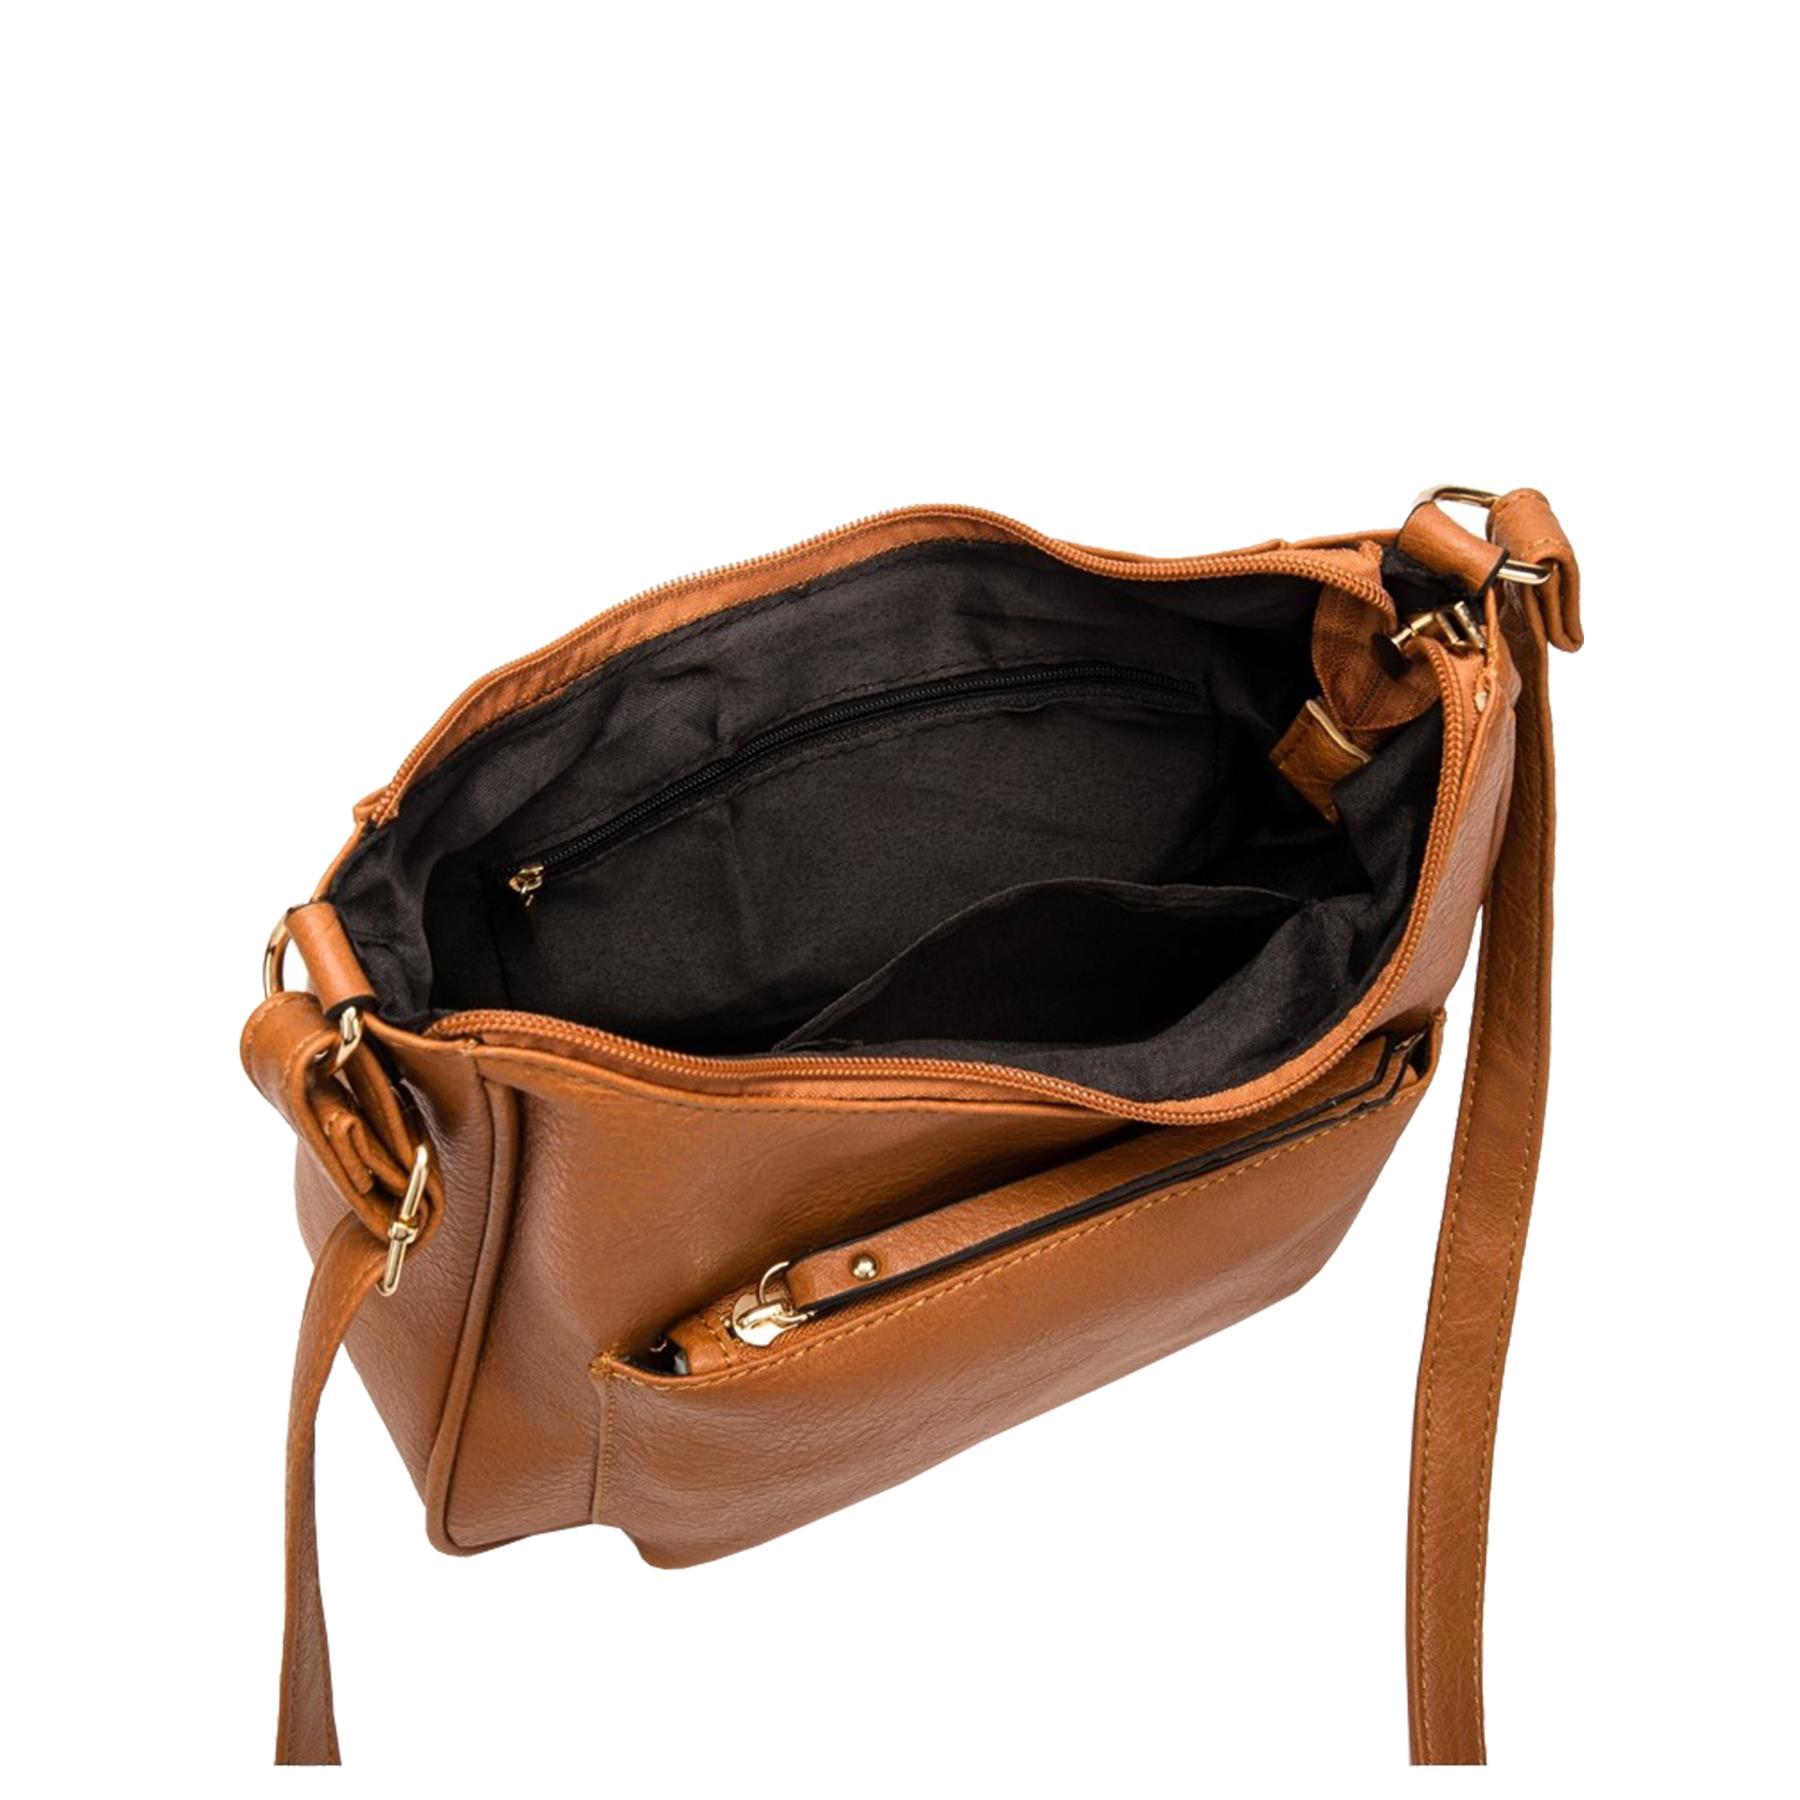 New-Soft-Synthetic-Leather-Front-Pocket-Ladies-Casual-Crossbody-Bag-Handbag thumbnail 16